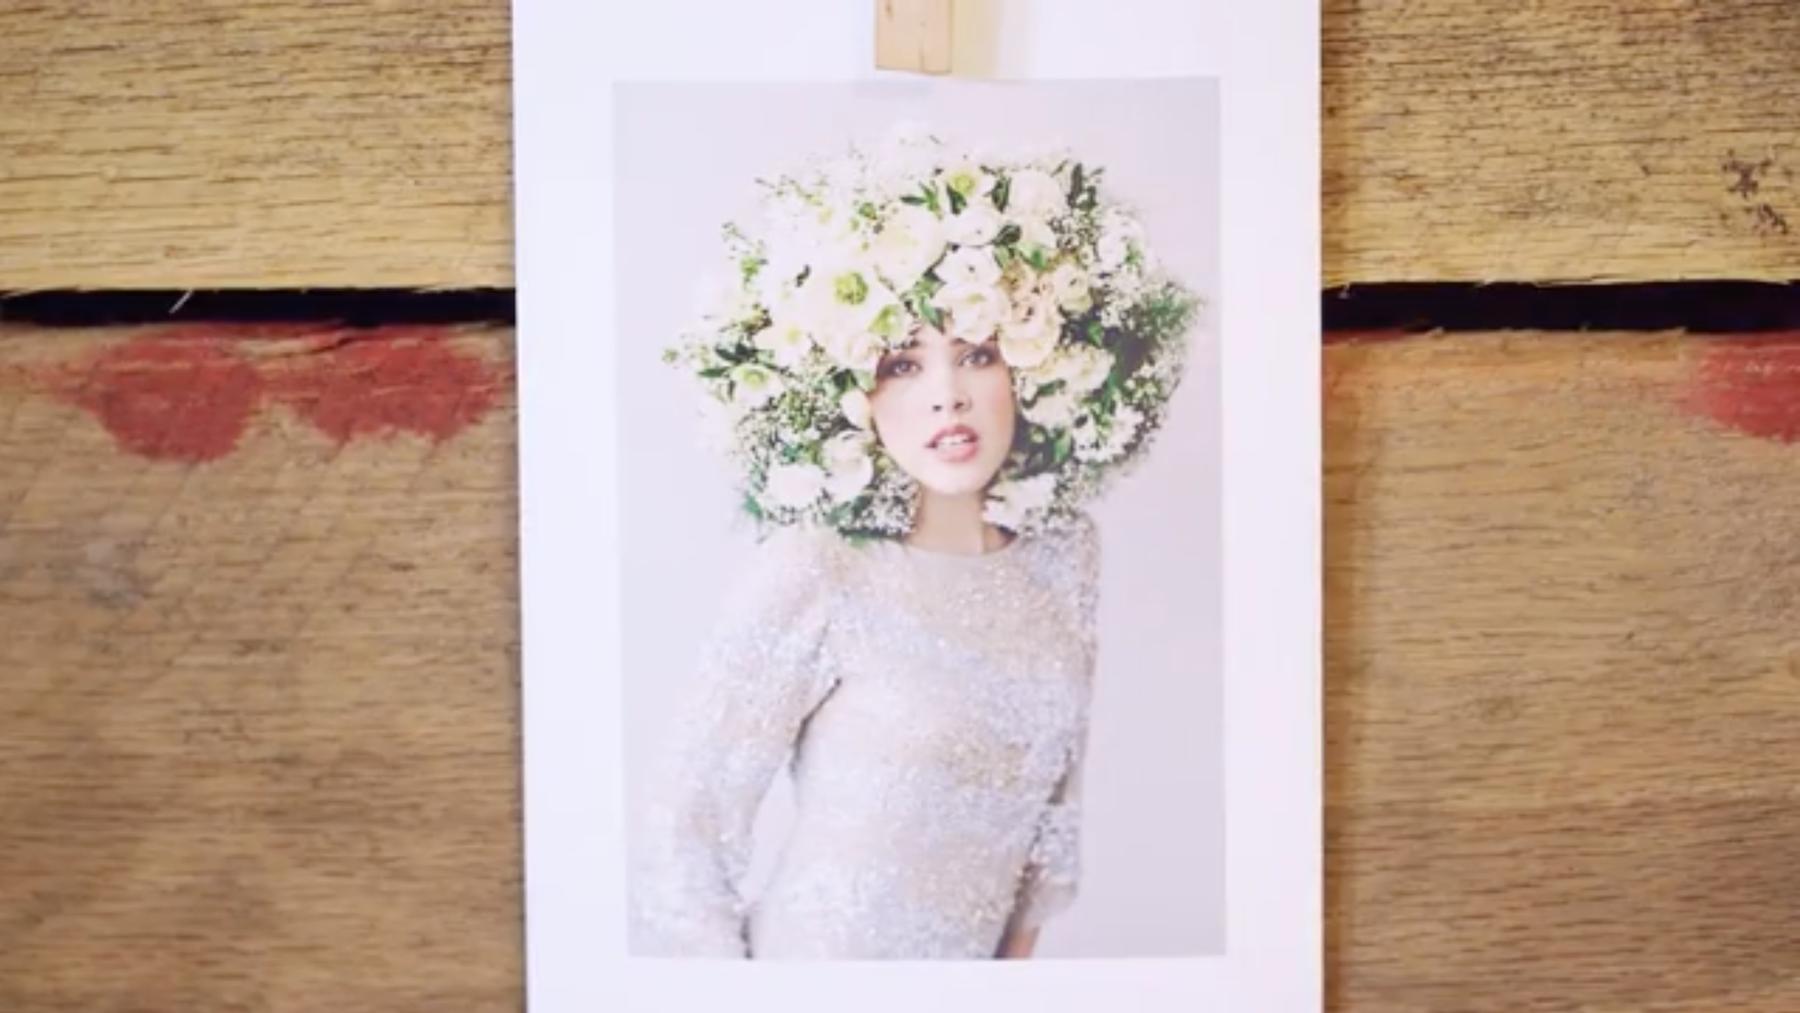 Wistia Video Thumbnail Sites 13739 Video K3v8khy6reyk79urjnxv Intro V1 1 Mp4 Floral Design Passion Flower Flower Show